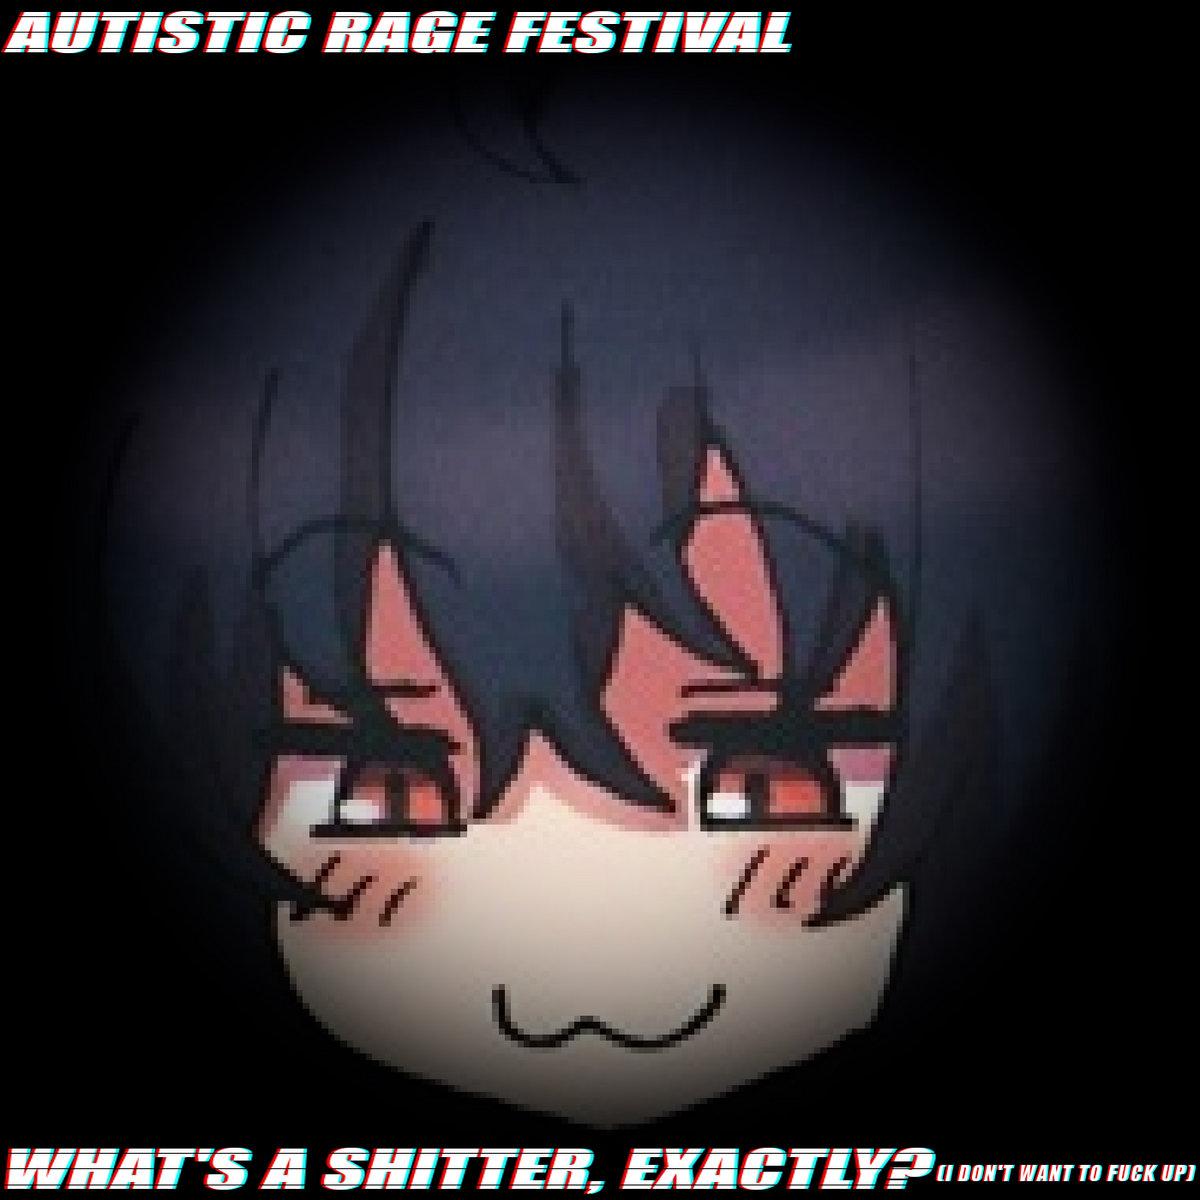 314Chan shitposting mock 2 | autistic rage festival 2